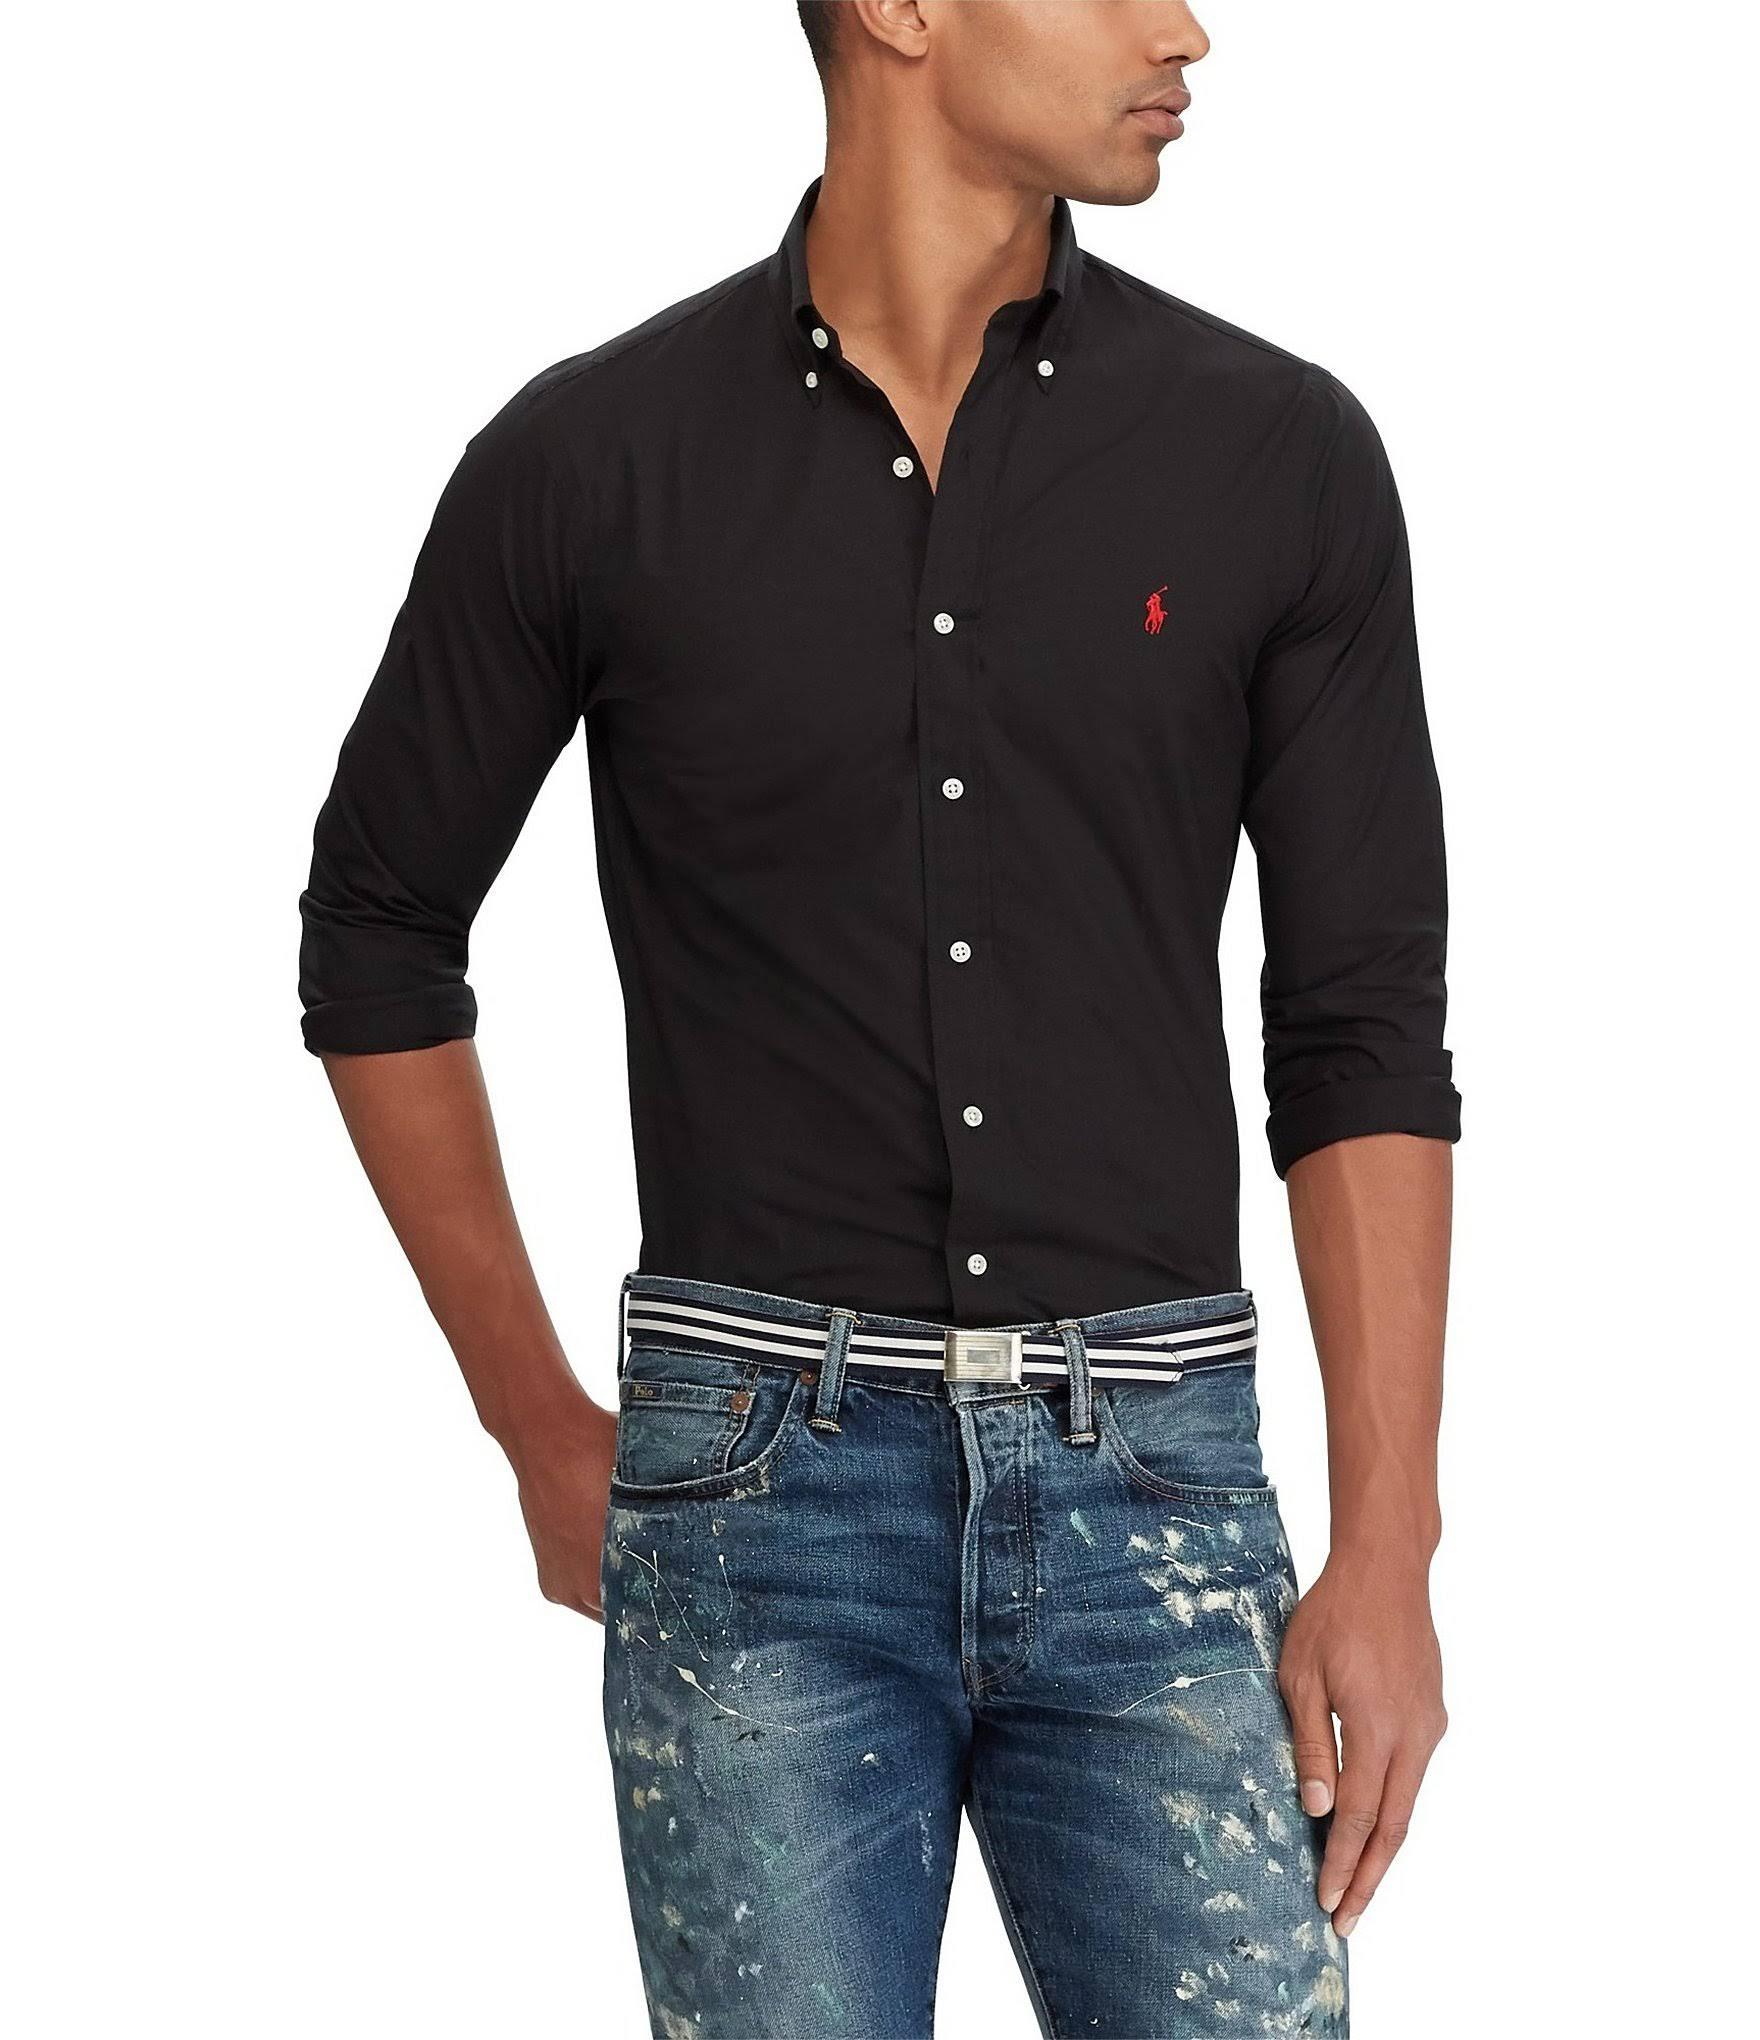 Polo Popeline Ralph Lauren Schwarzes shirt AqArtw